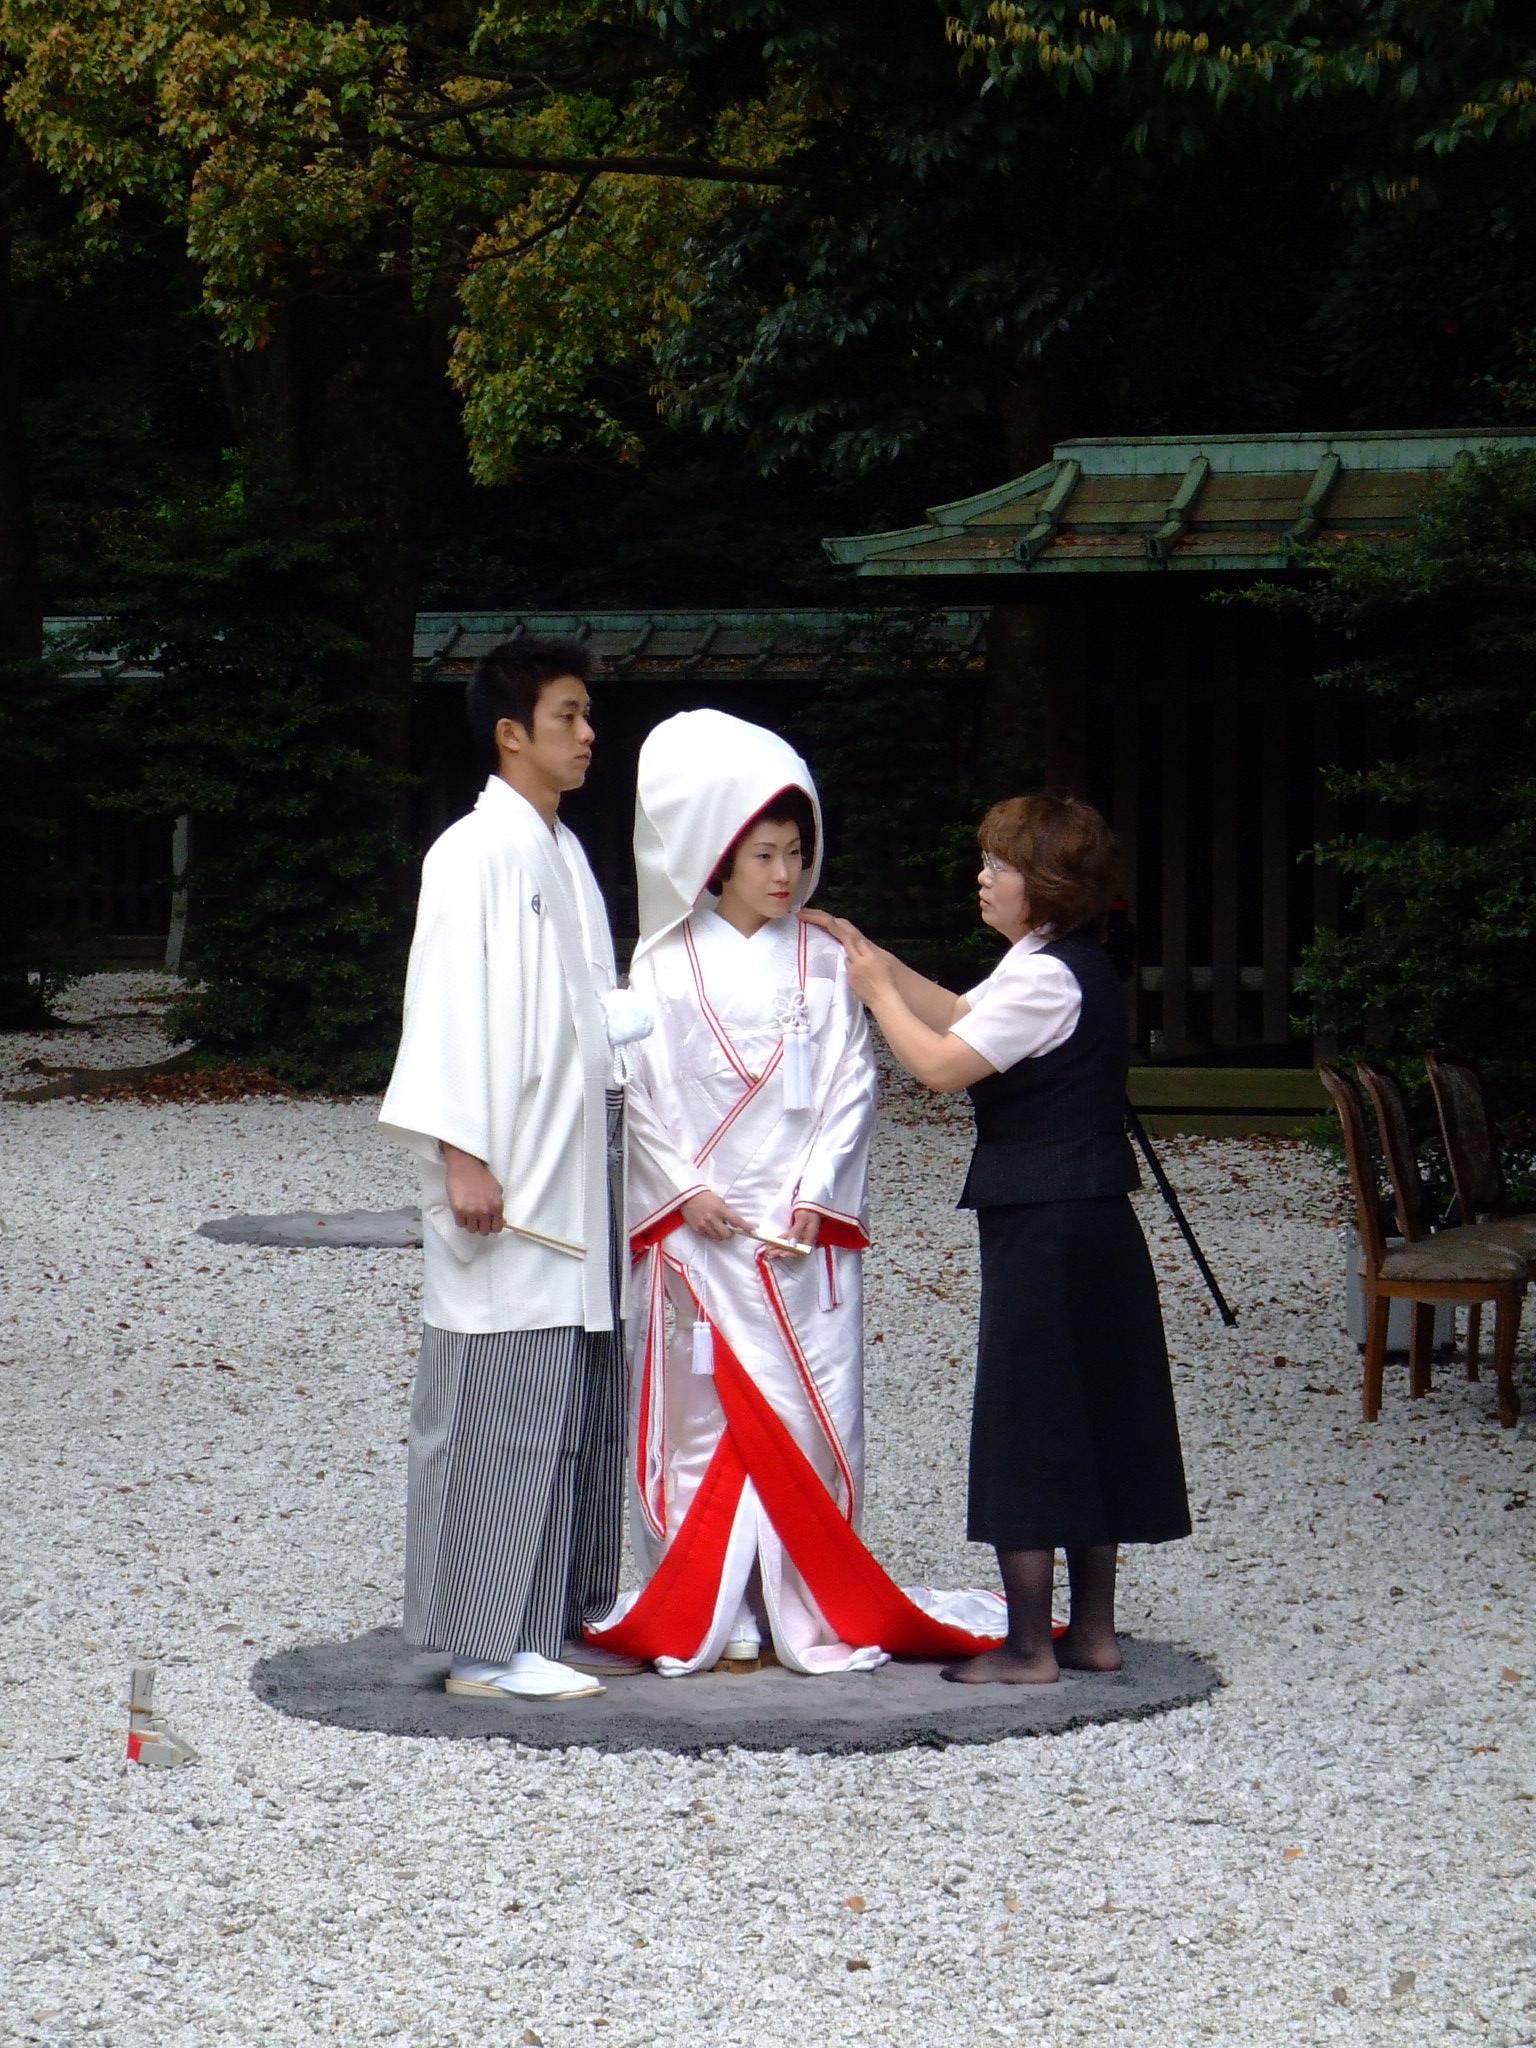 Http Commons Wikimedia Org Wiki File Traditional Shinto Wedding At Meiji Jingu Jpg